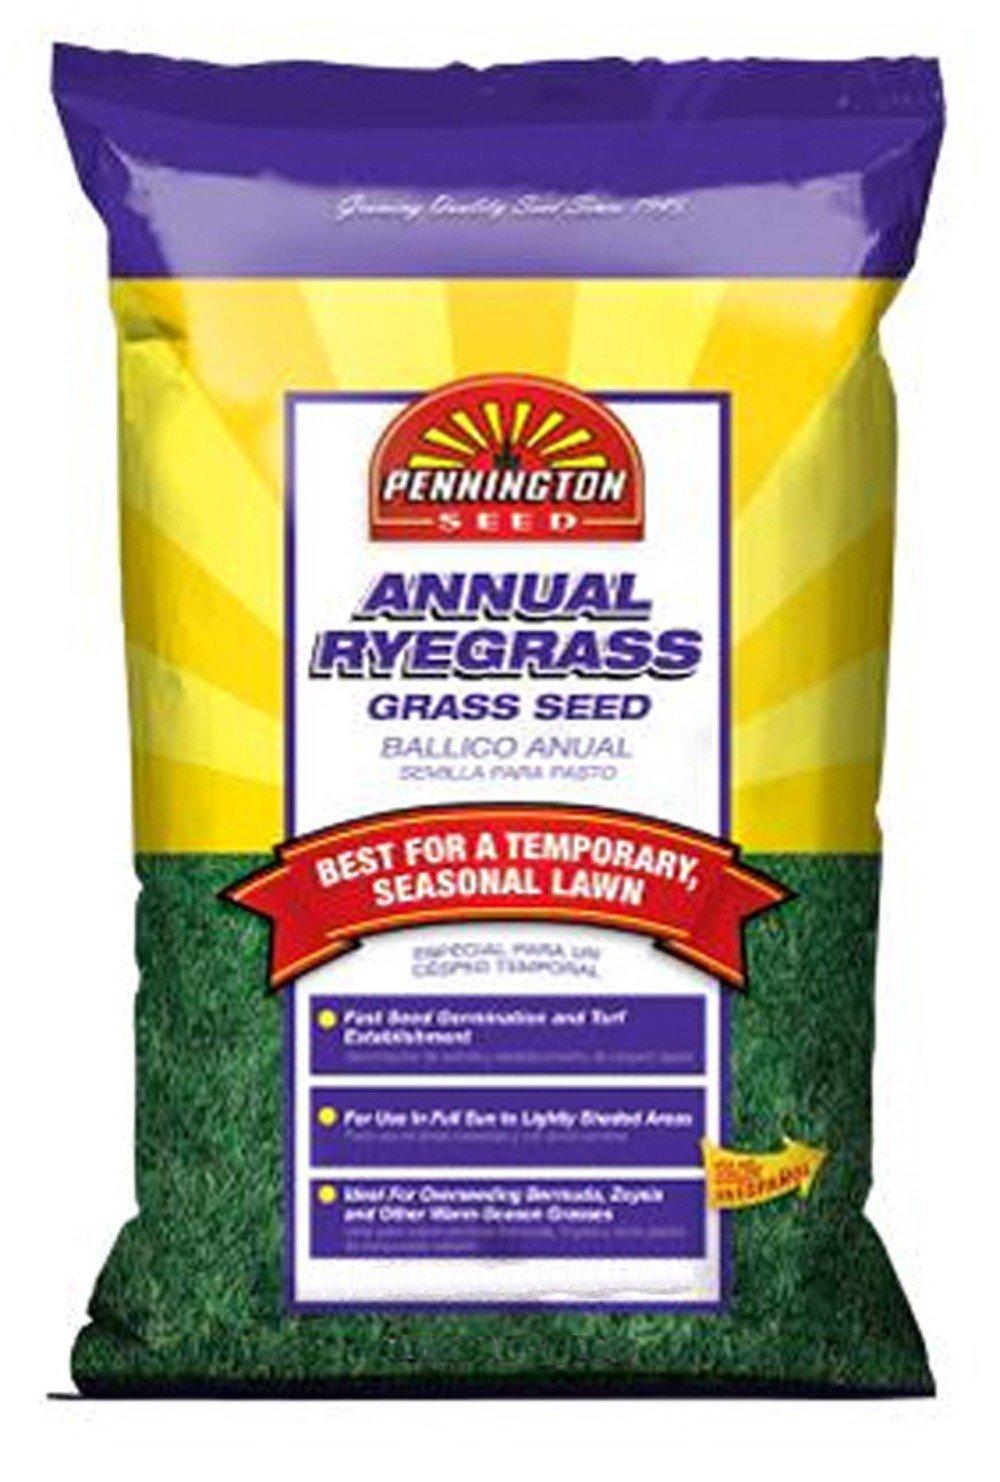 Pennington Annual Ryegrass to Overseed Warm Season Grasses, 10 lb